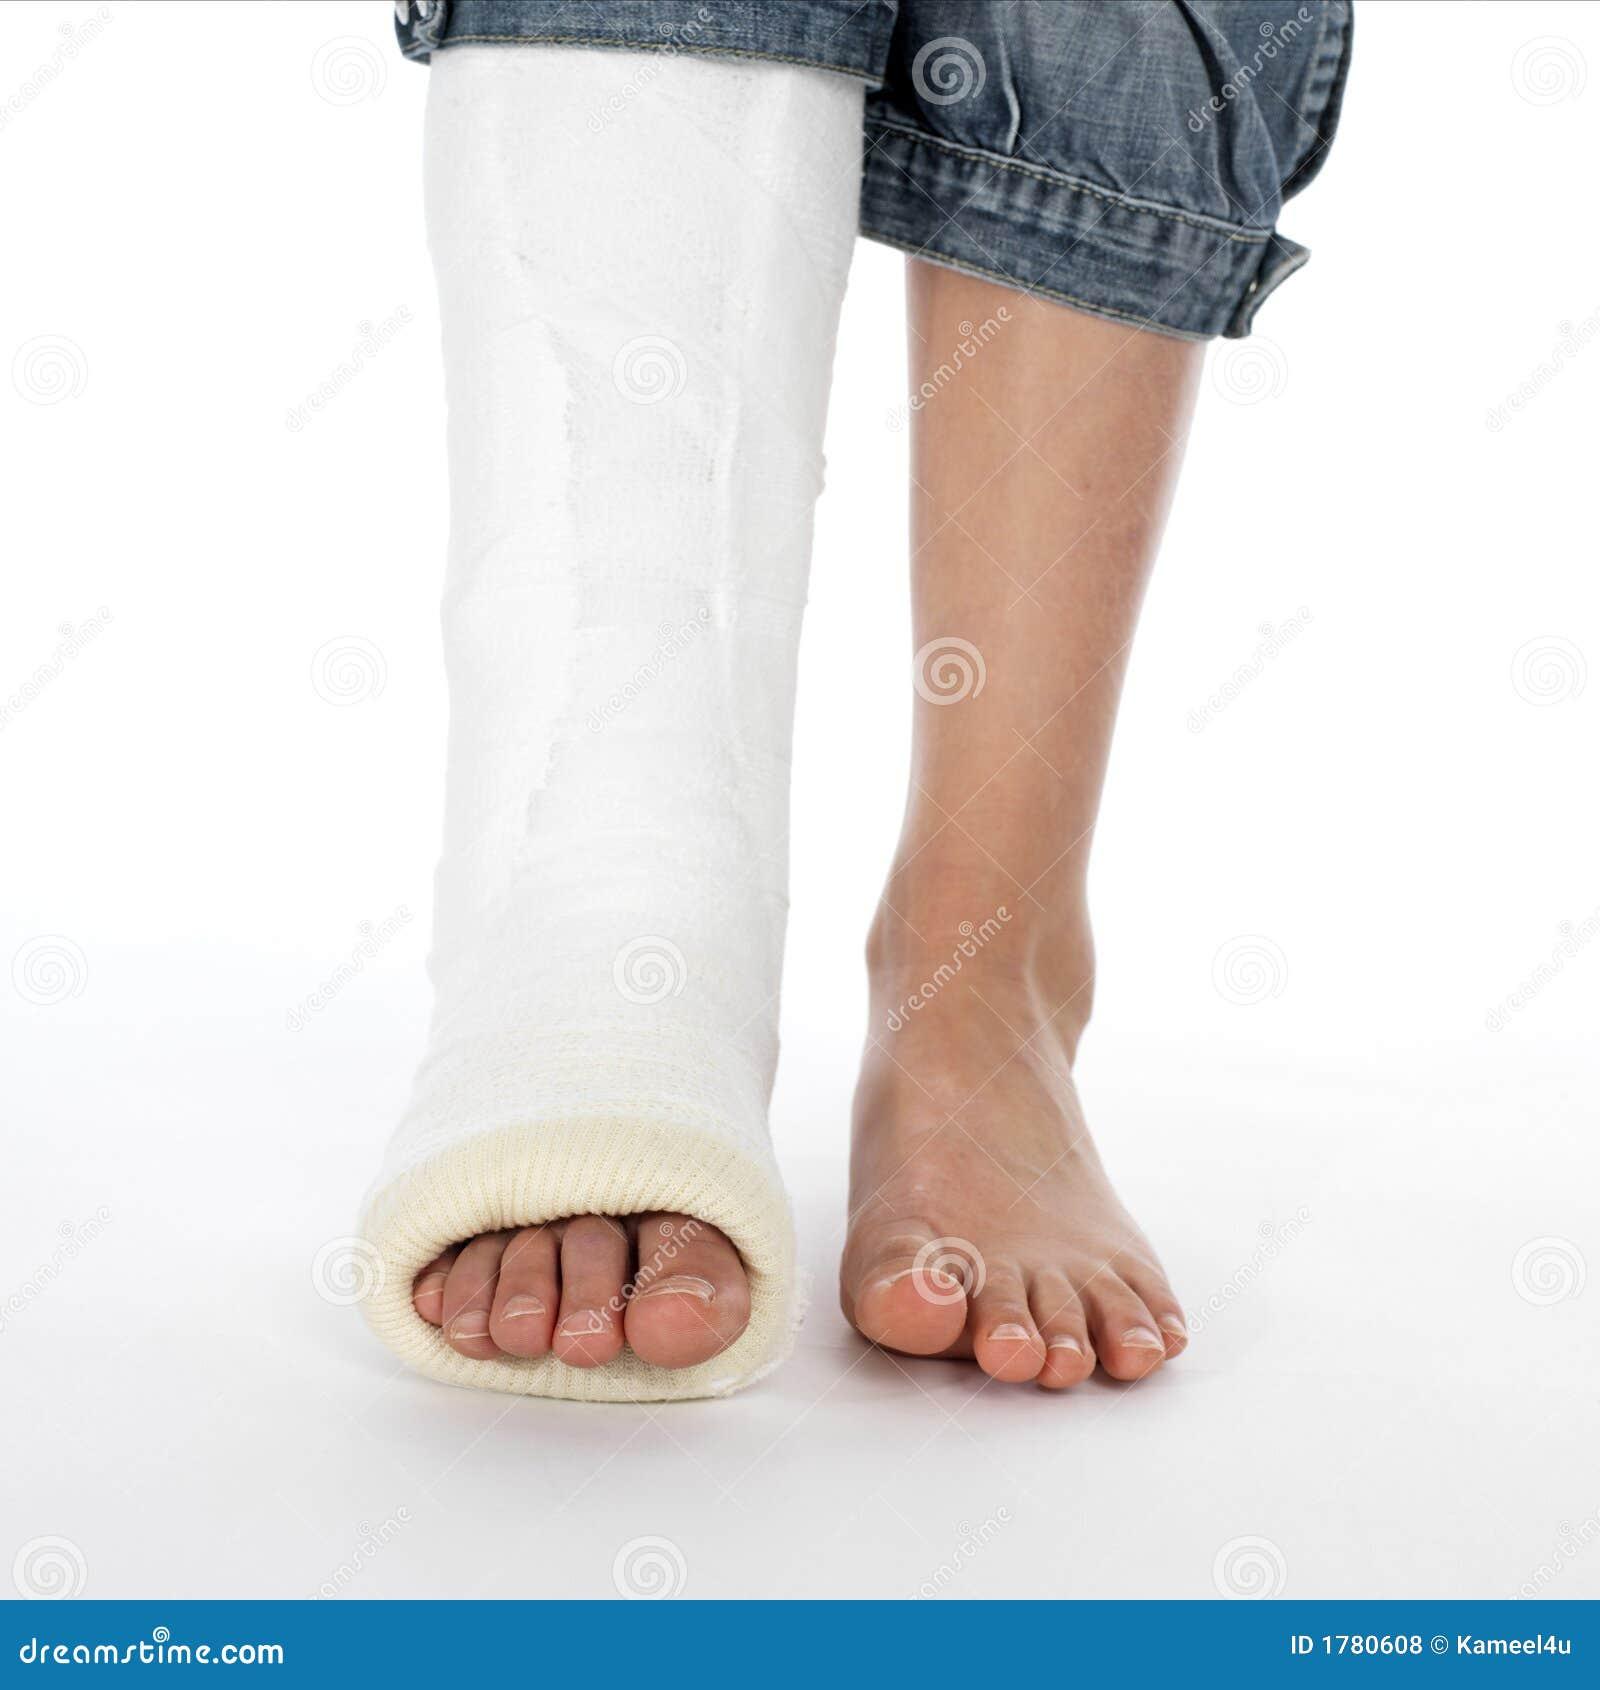 girl with a broken leg royalty free stock photos image broken leg clipart free broken ankle clipart